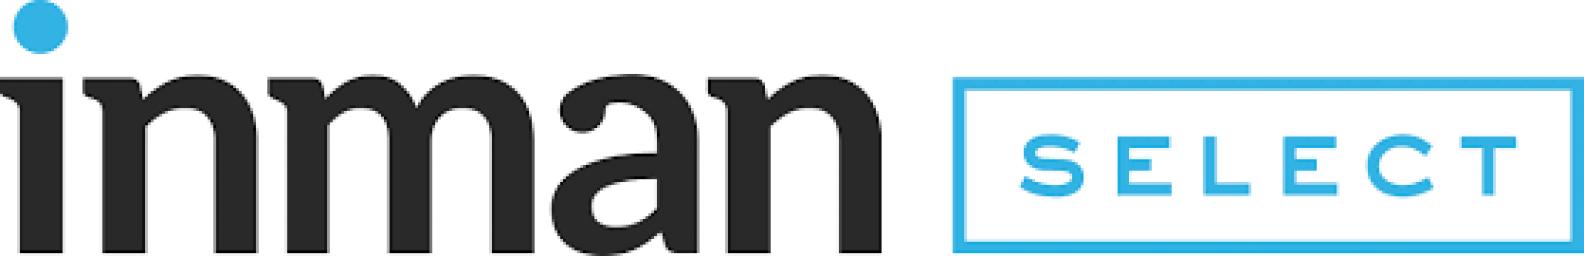 Inman-Select.png